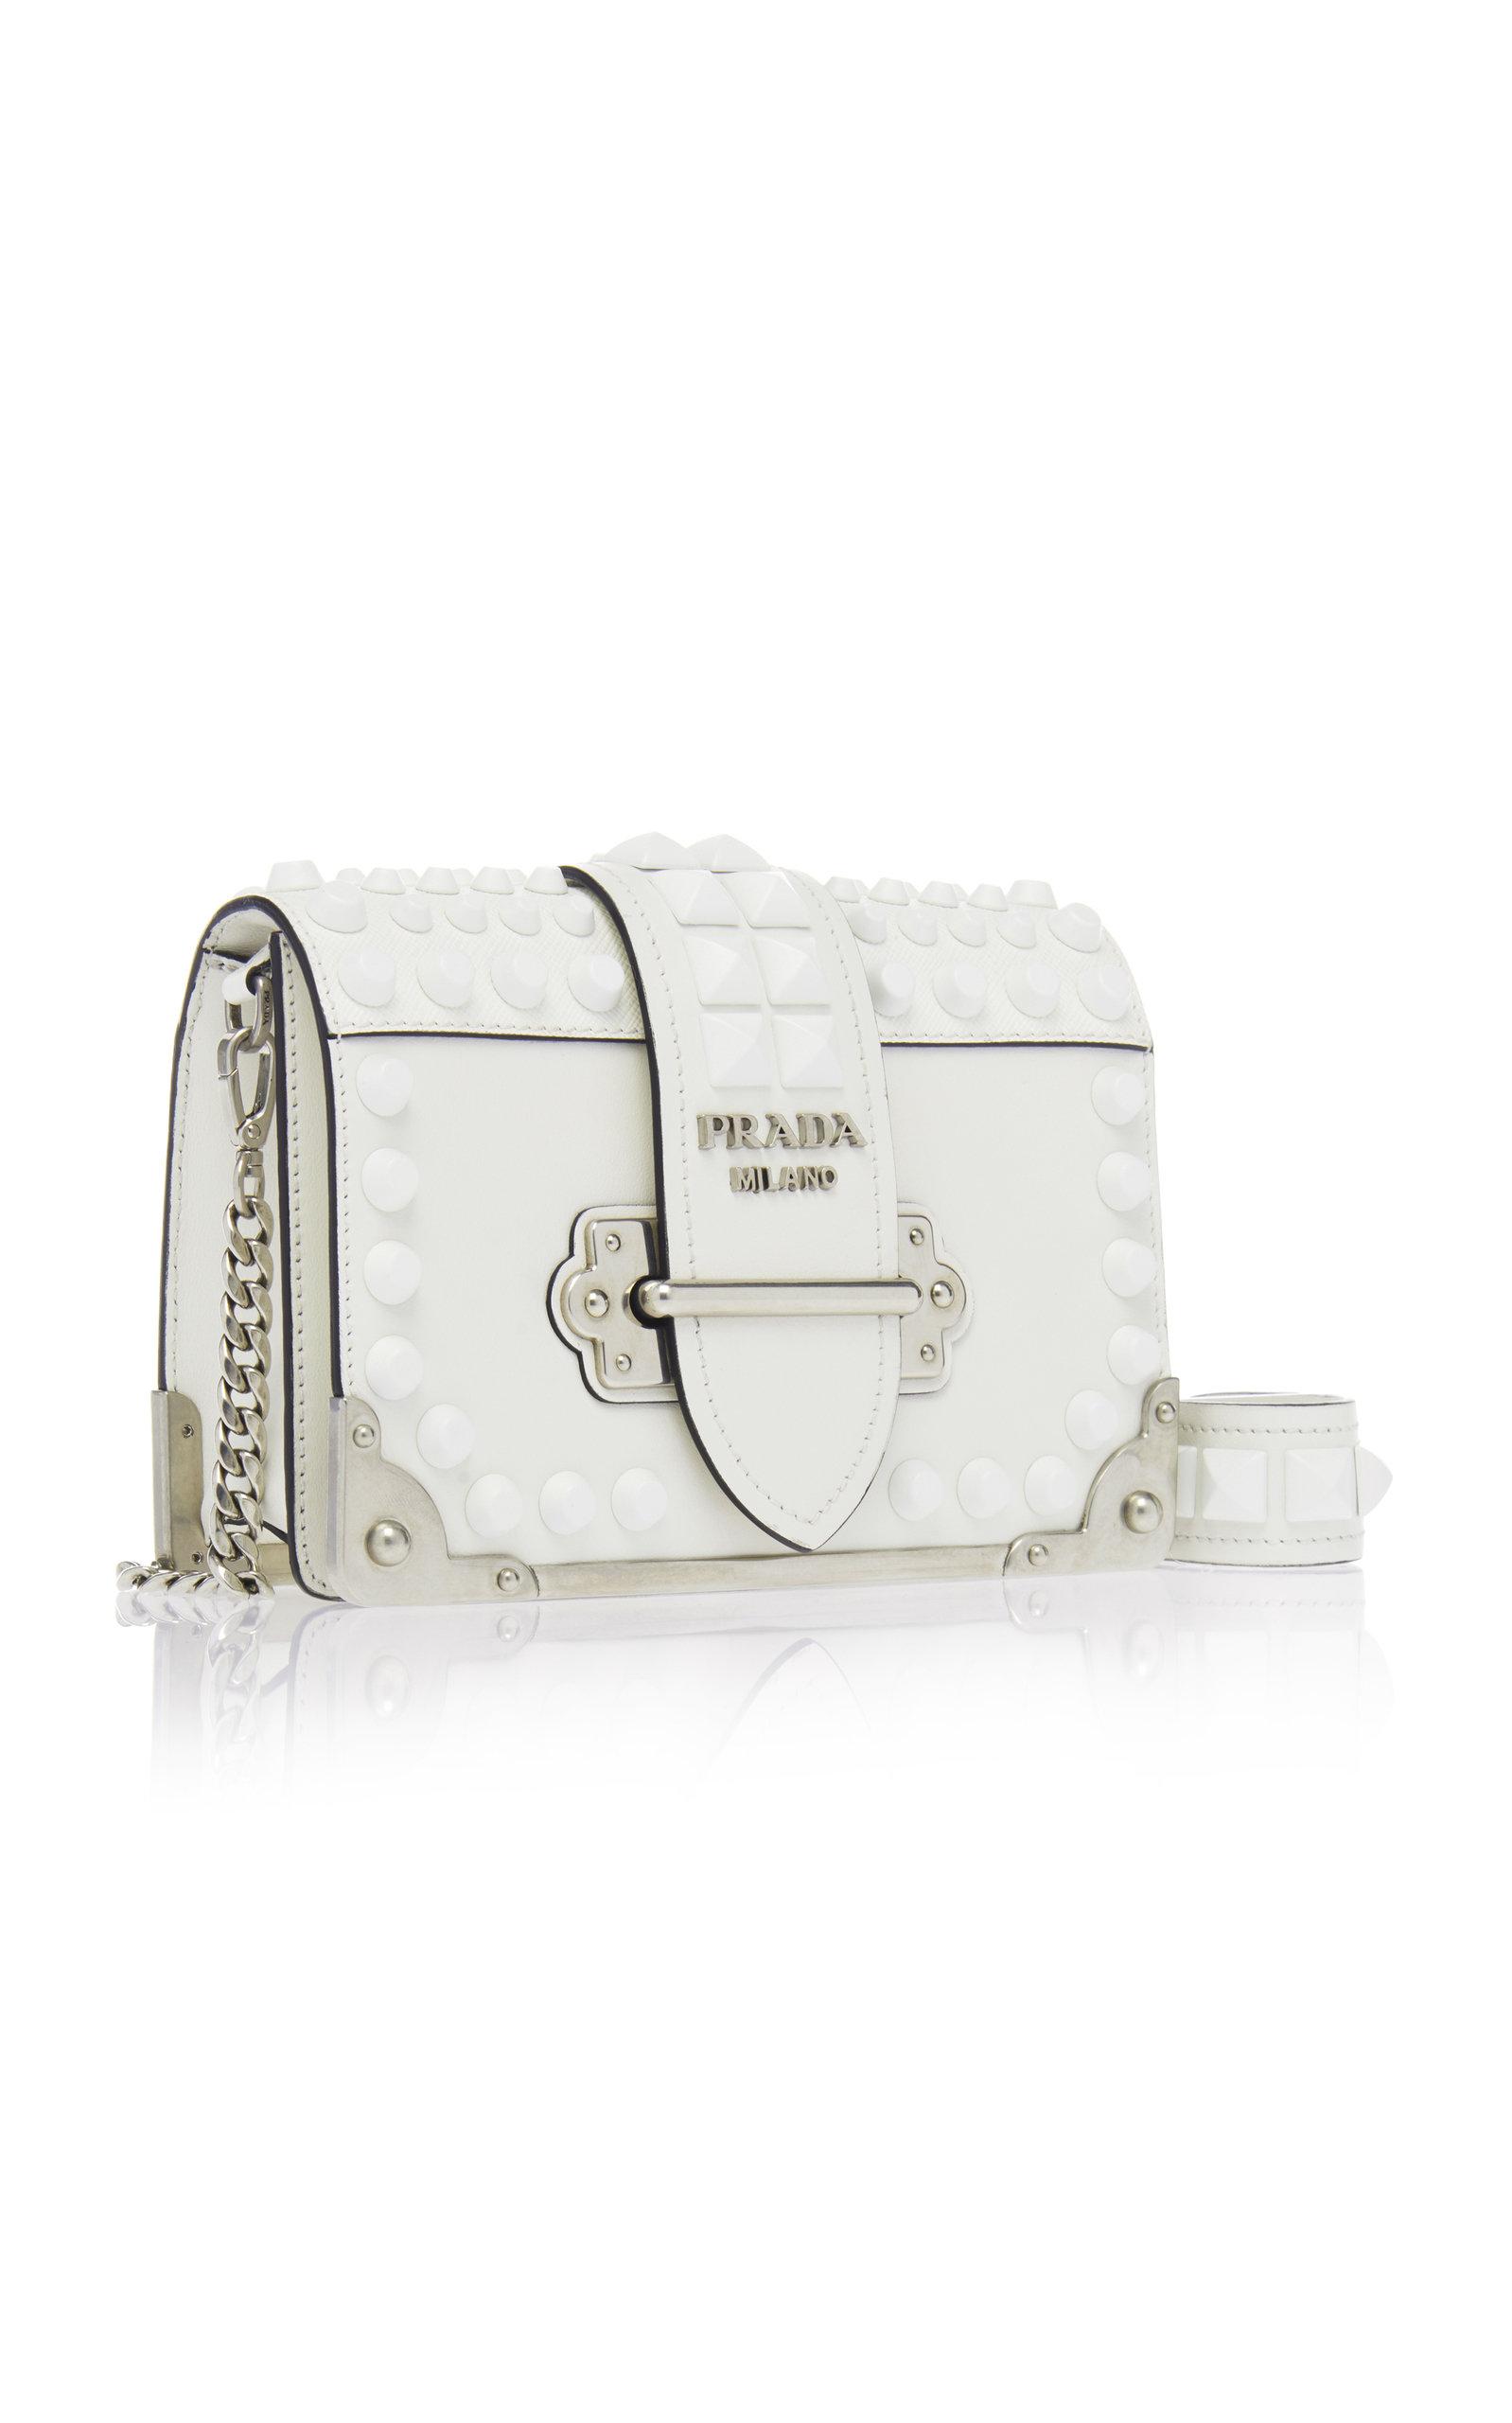 27b6ab41ef0e PradaEmbellished Cahier Leather Shoulder Bag. CLOSE. Loading. Loading.  Loading